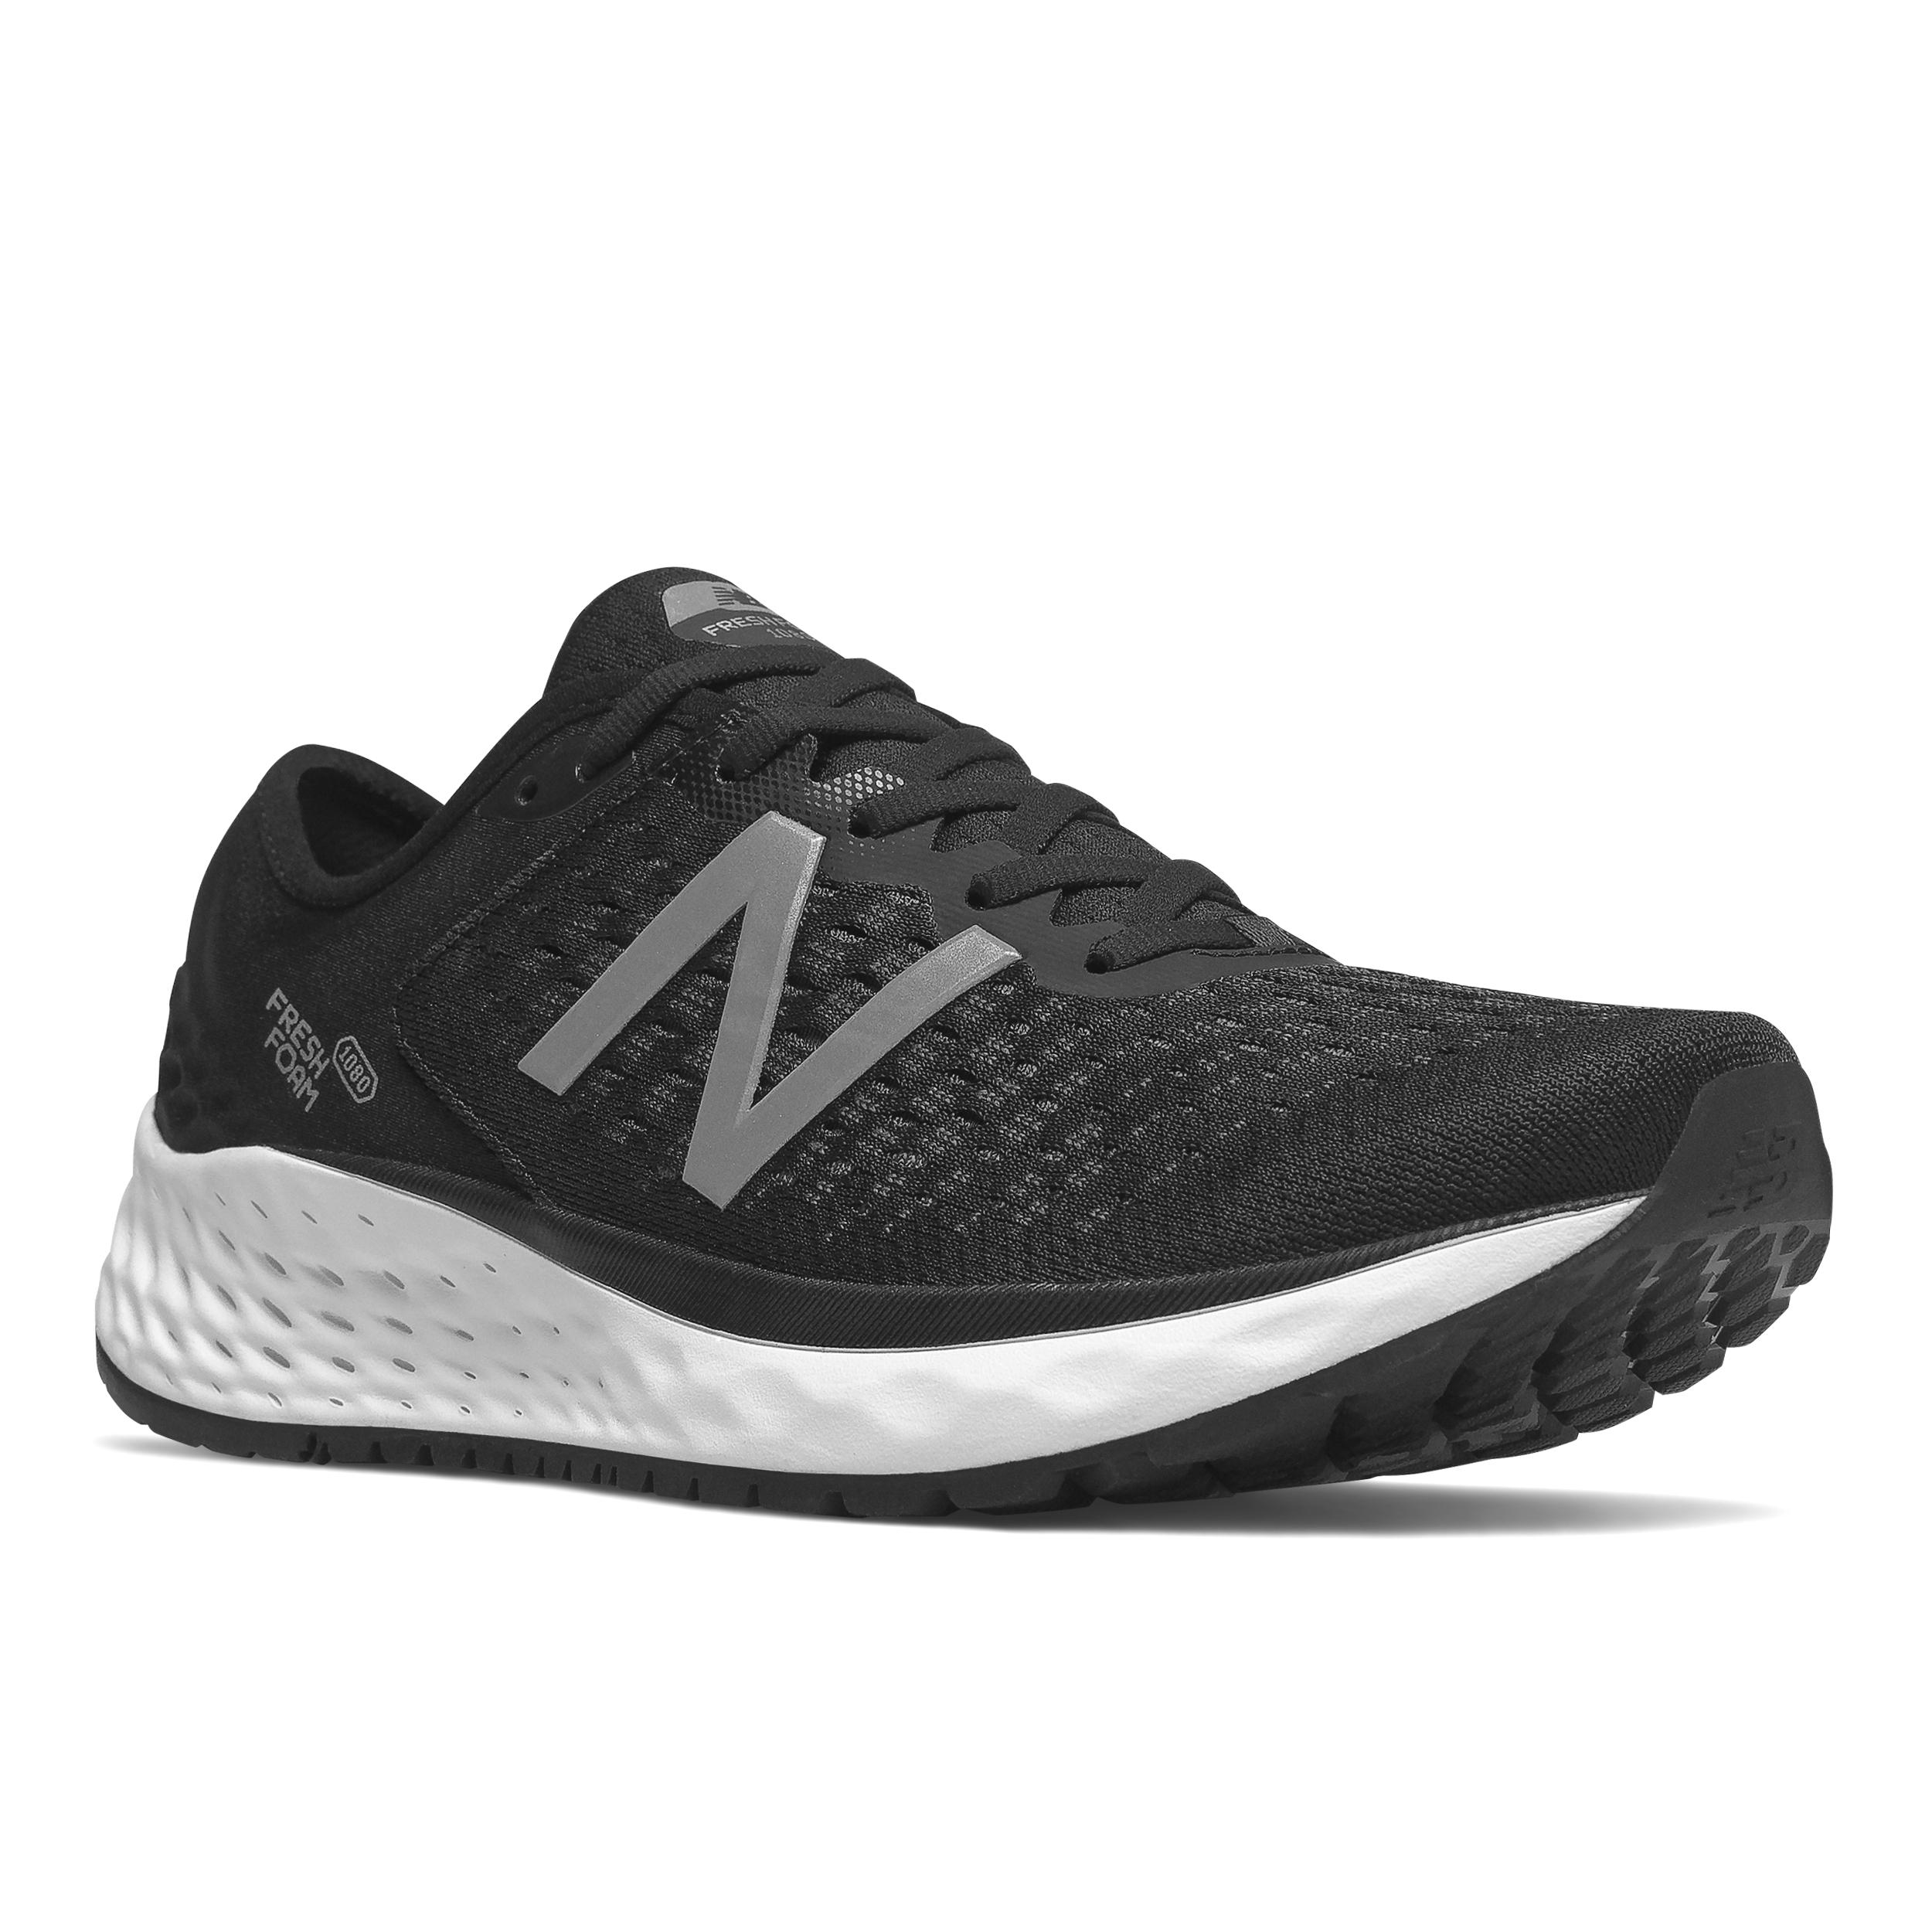 Details about Women s New Balance Fresh Foam 1080v9 Running Shoe Black White dcebd2b7163